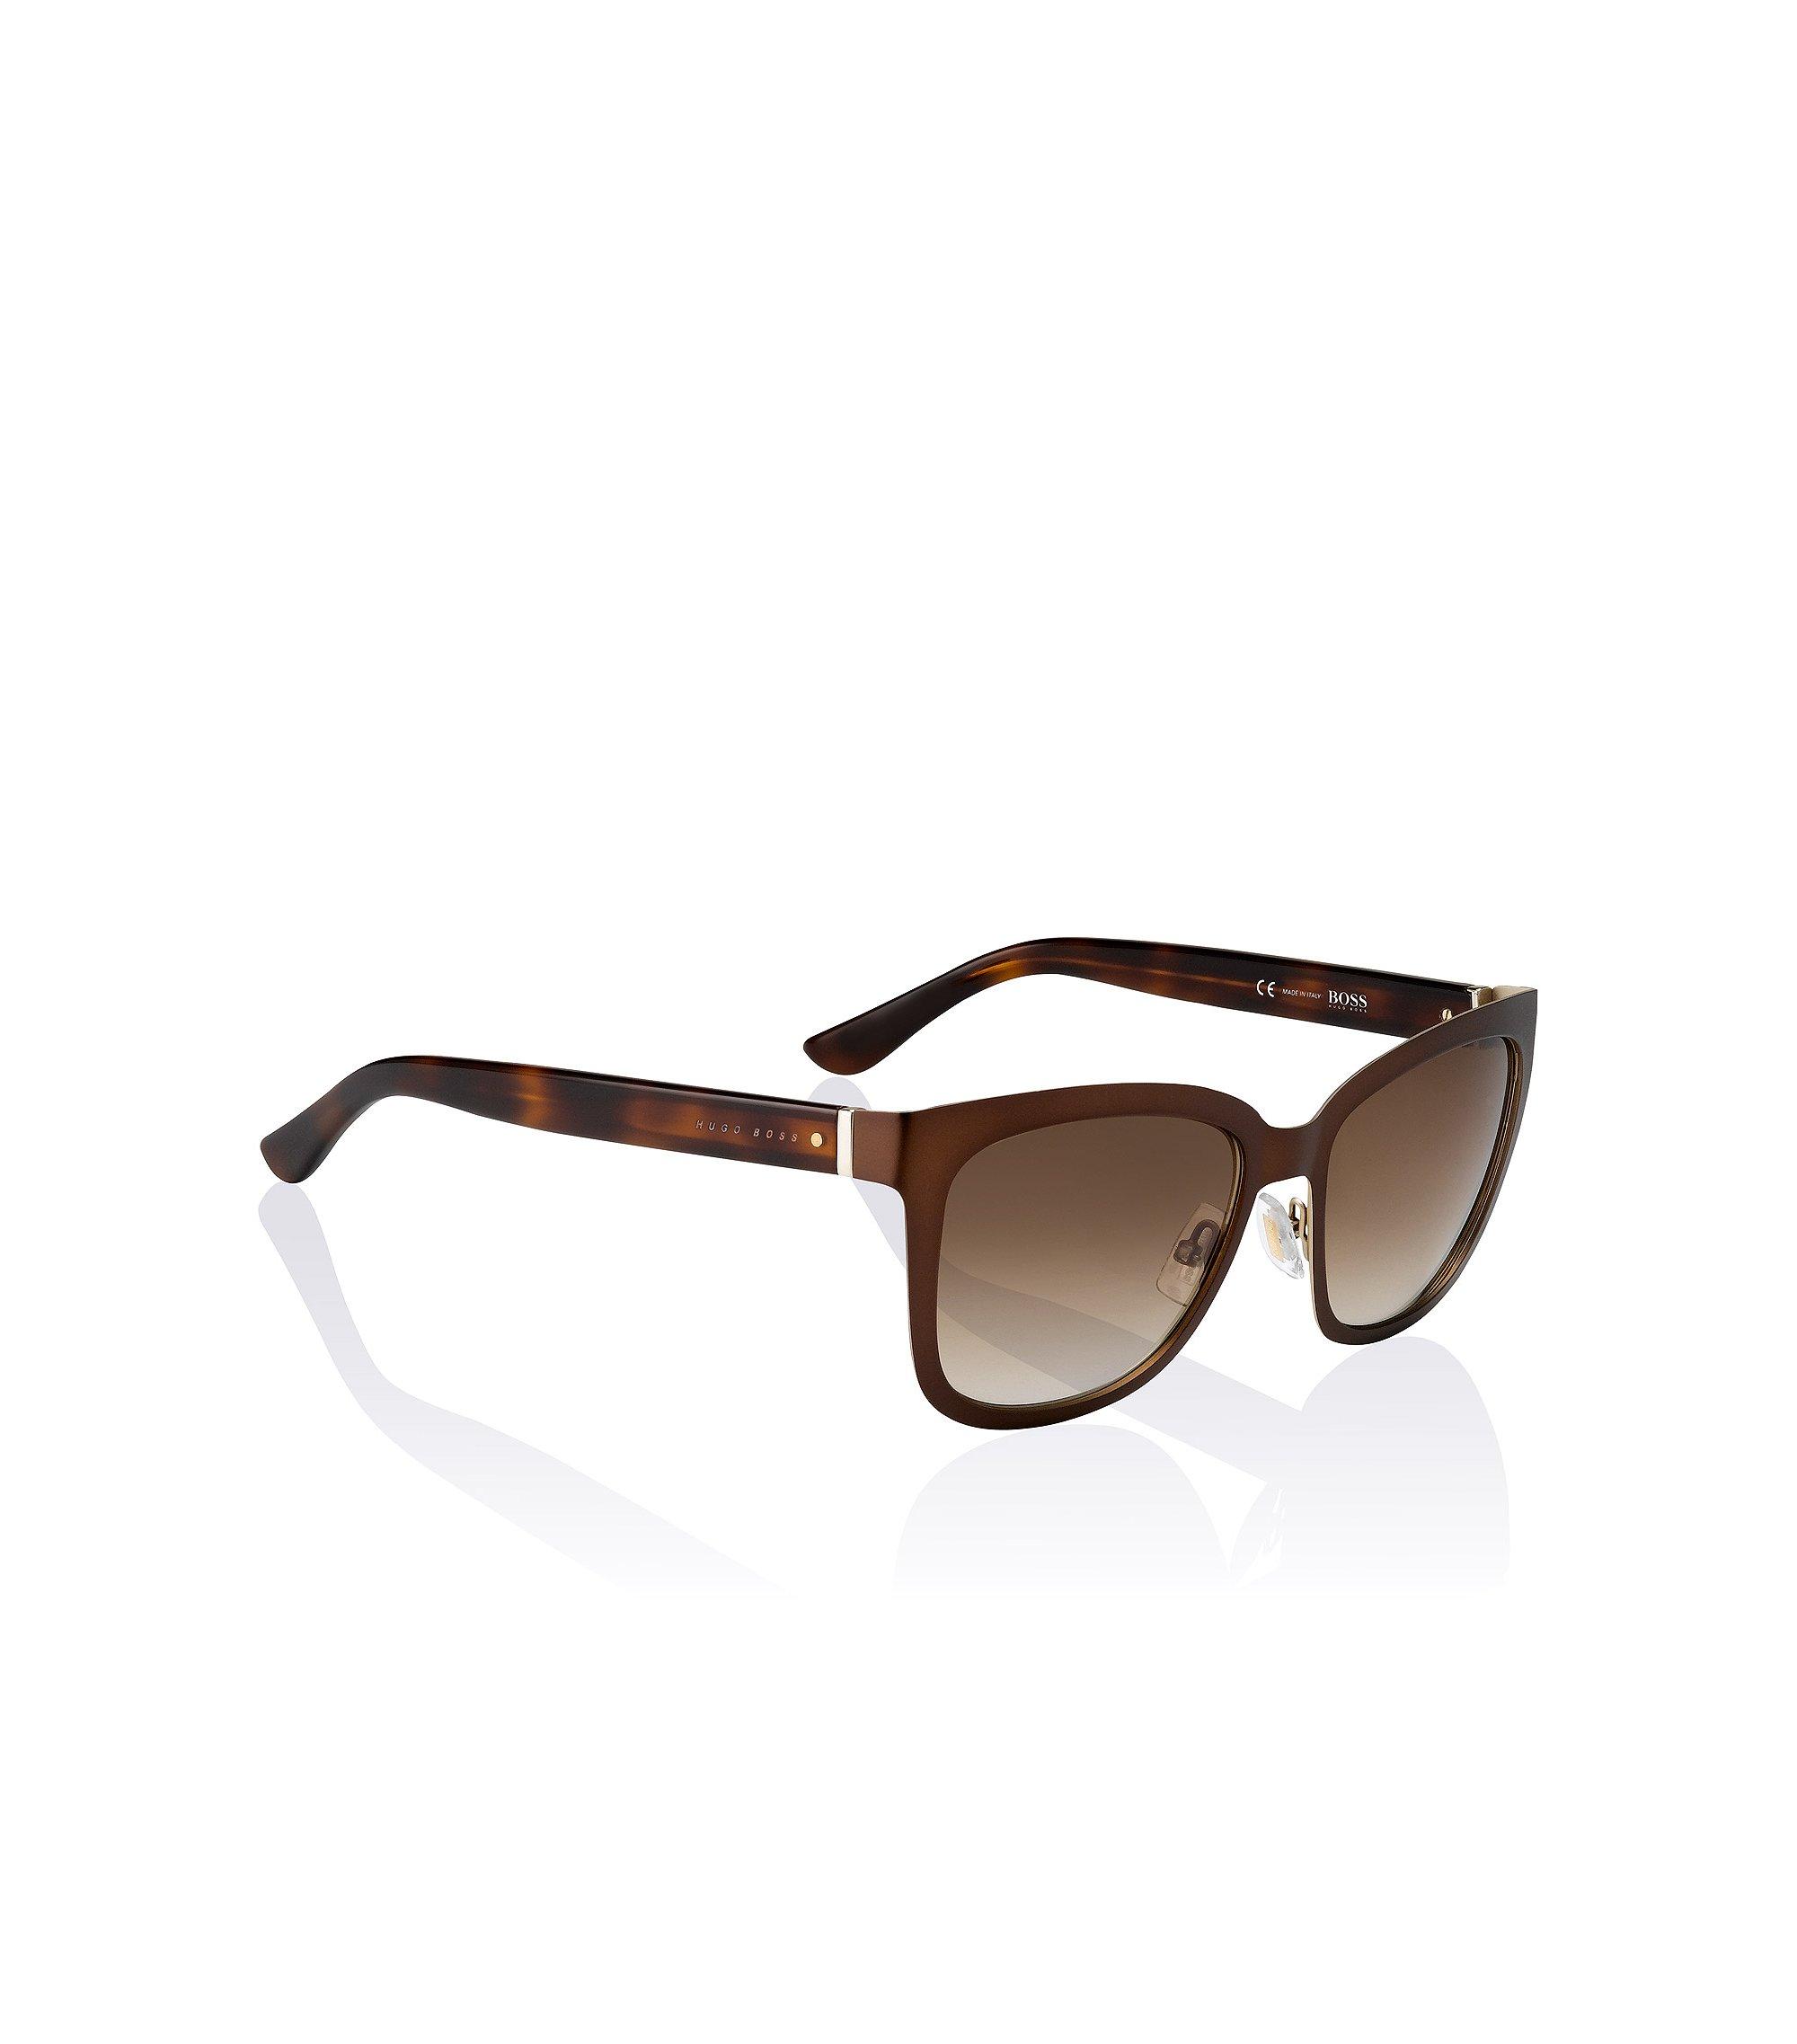 Sonnenbrille ´BOSS 0676` aus Acetat und Metall, Assorted-Pre-Pack